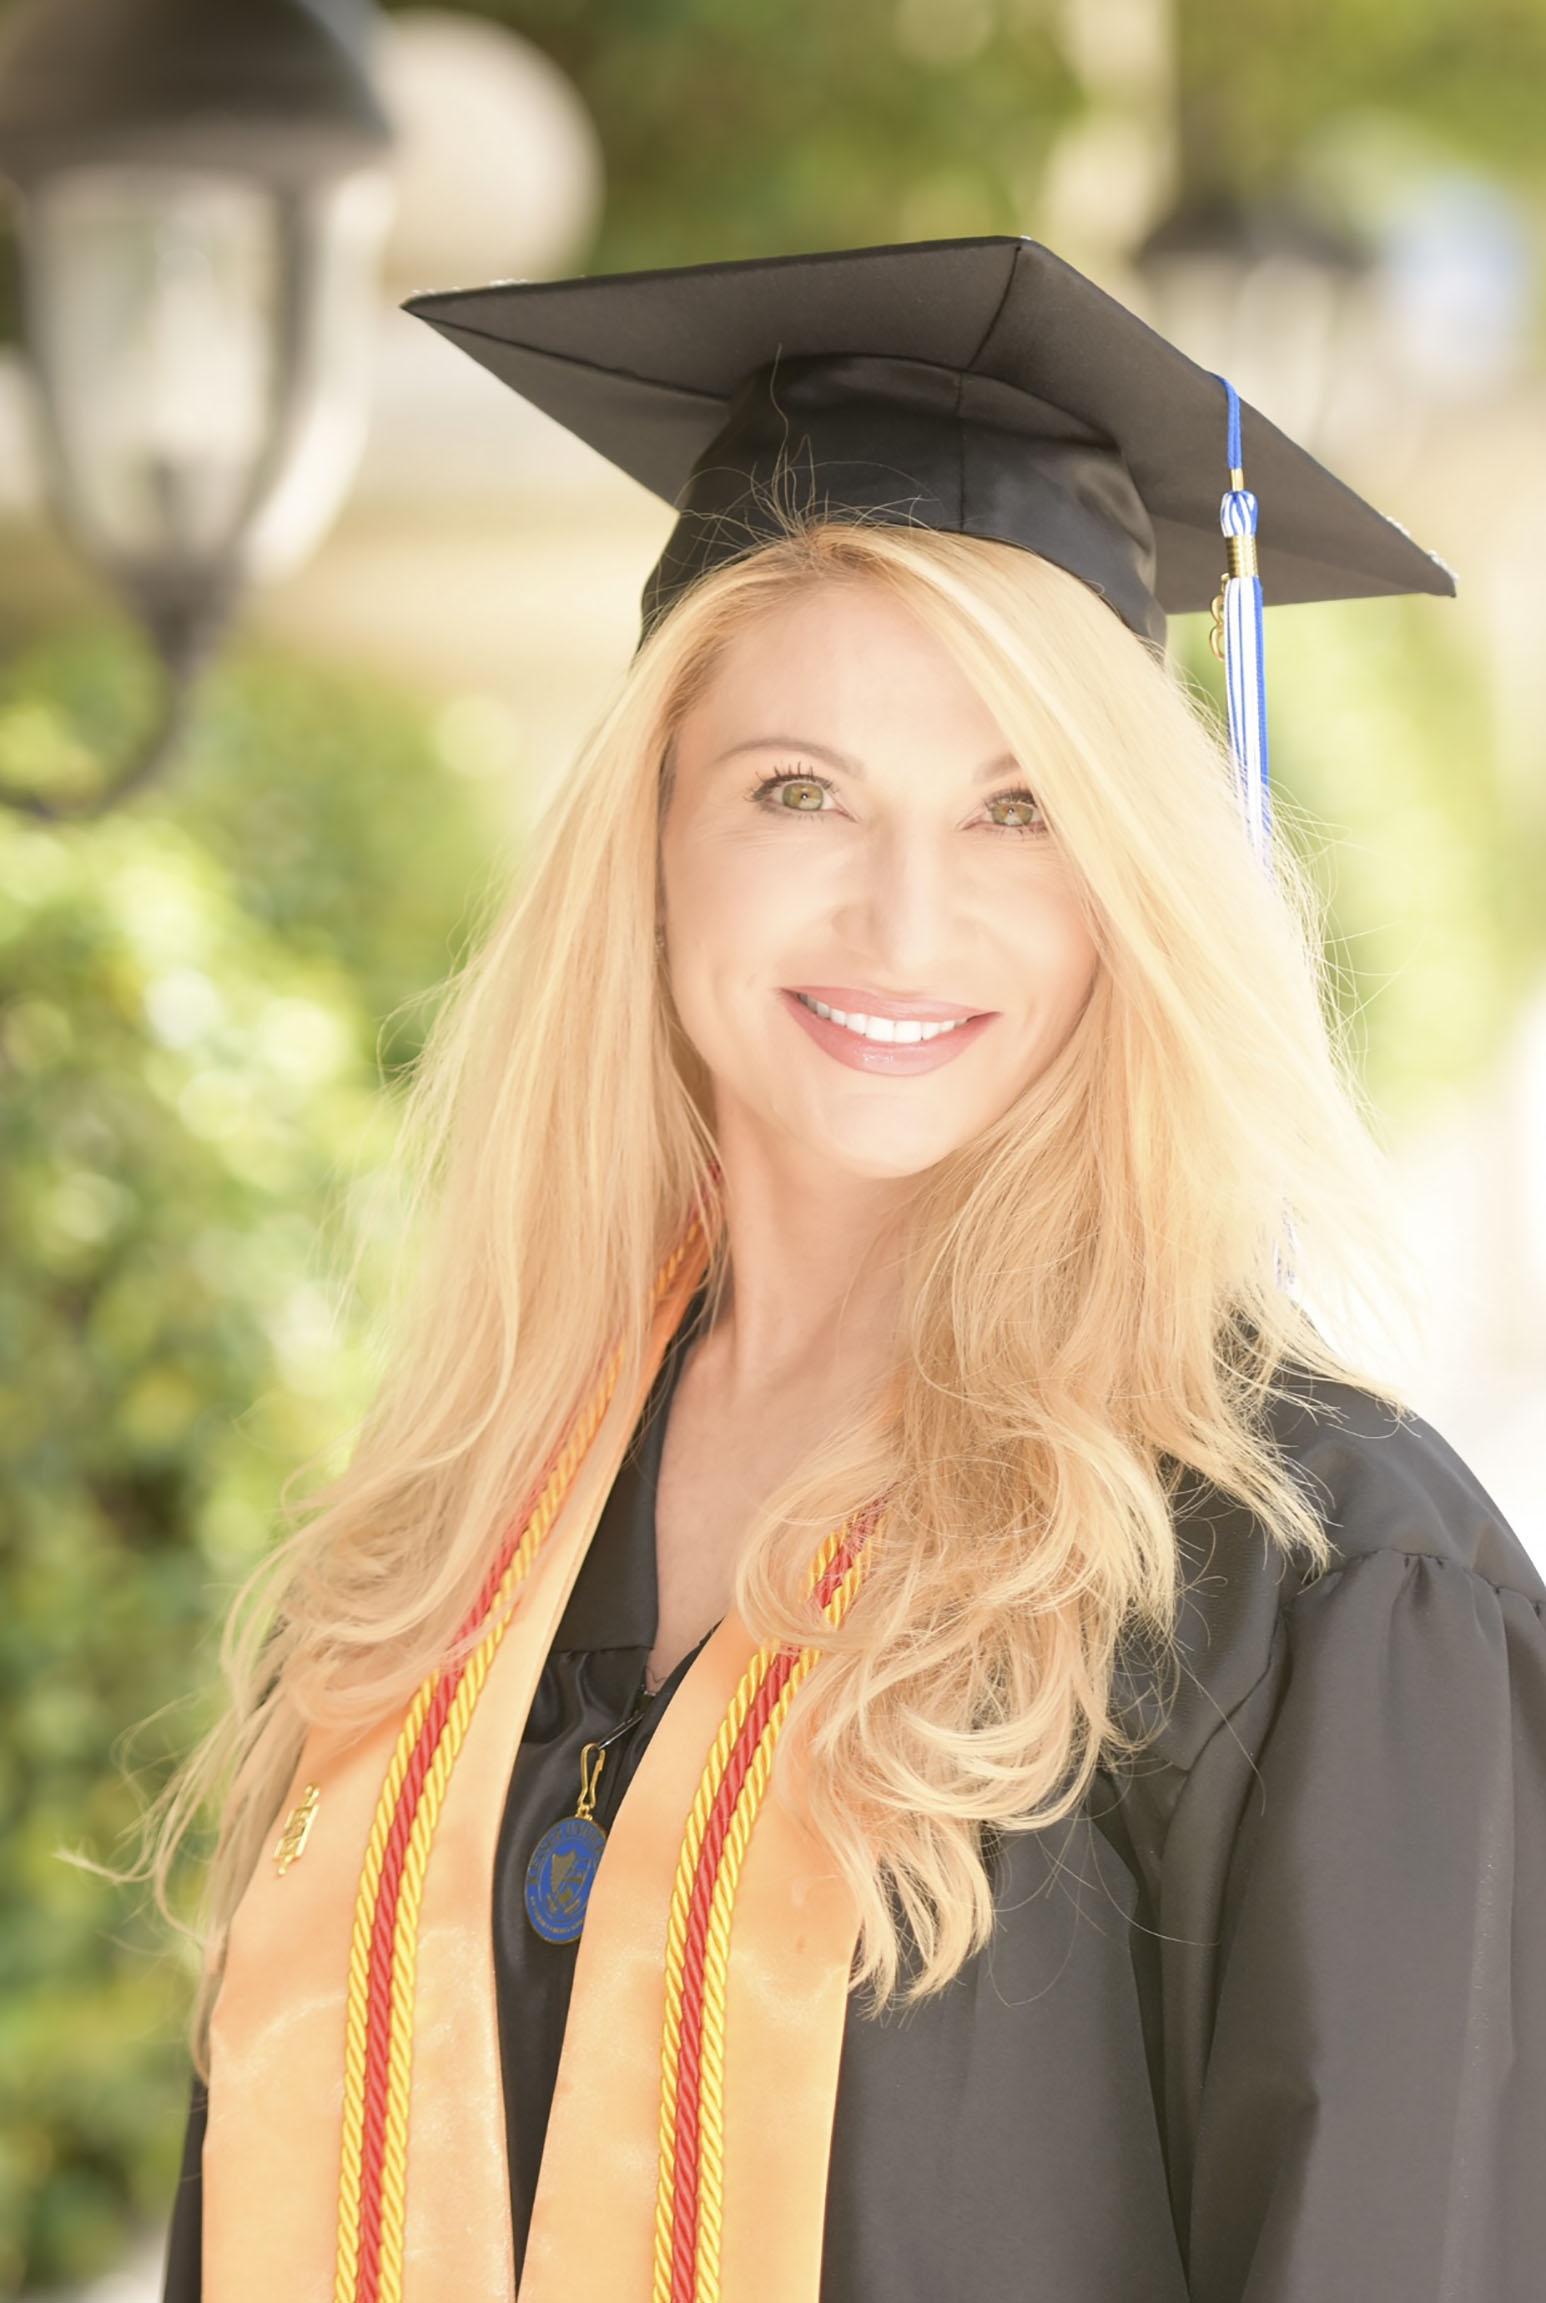 Keiser University Alumna Becomes Member of Elite Florida Emergency Response Team